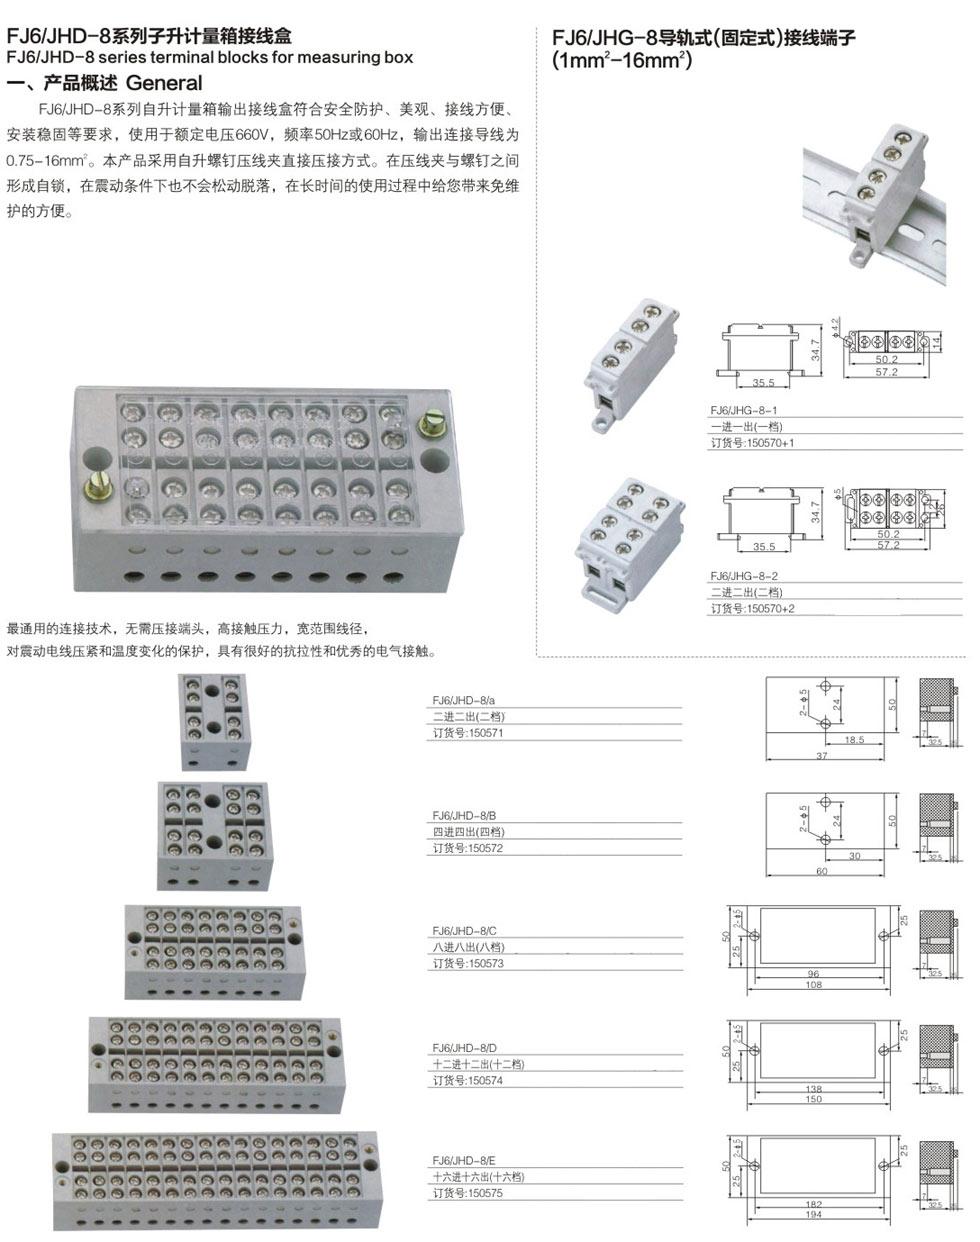 fj6/jhd-8系列自升计量箱输出接线盒